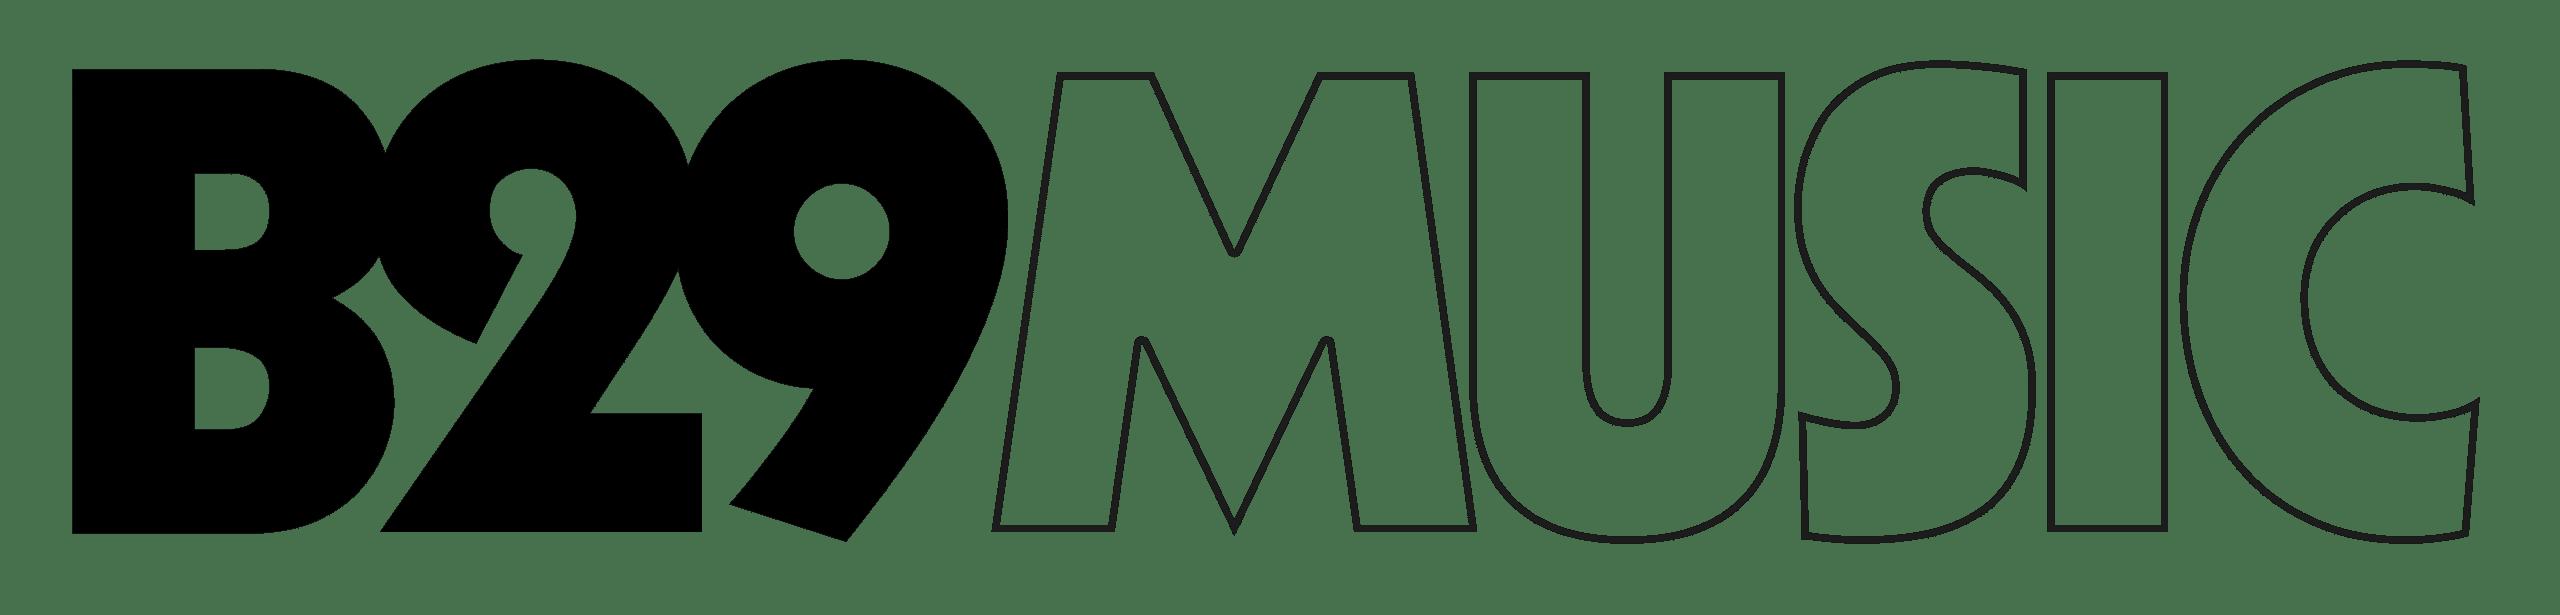 B29 music logo